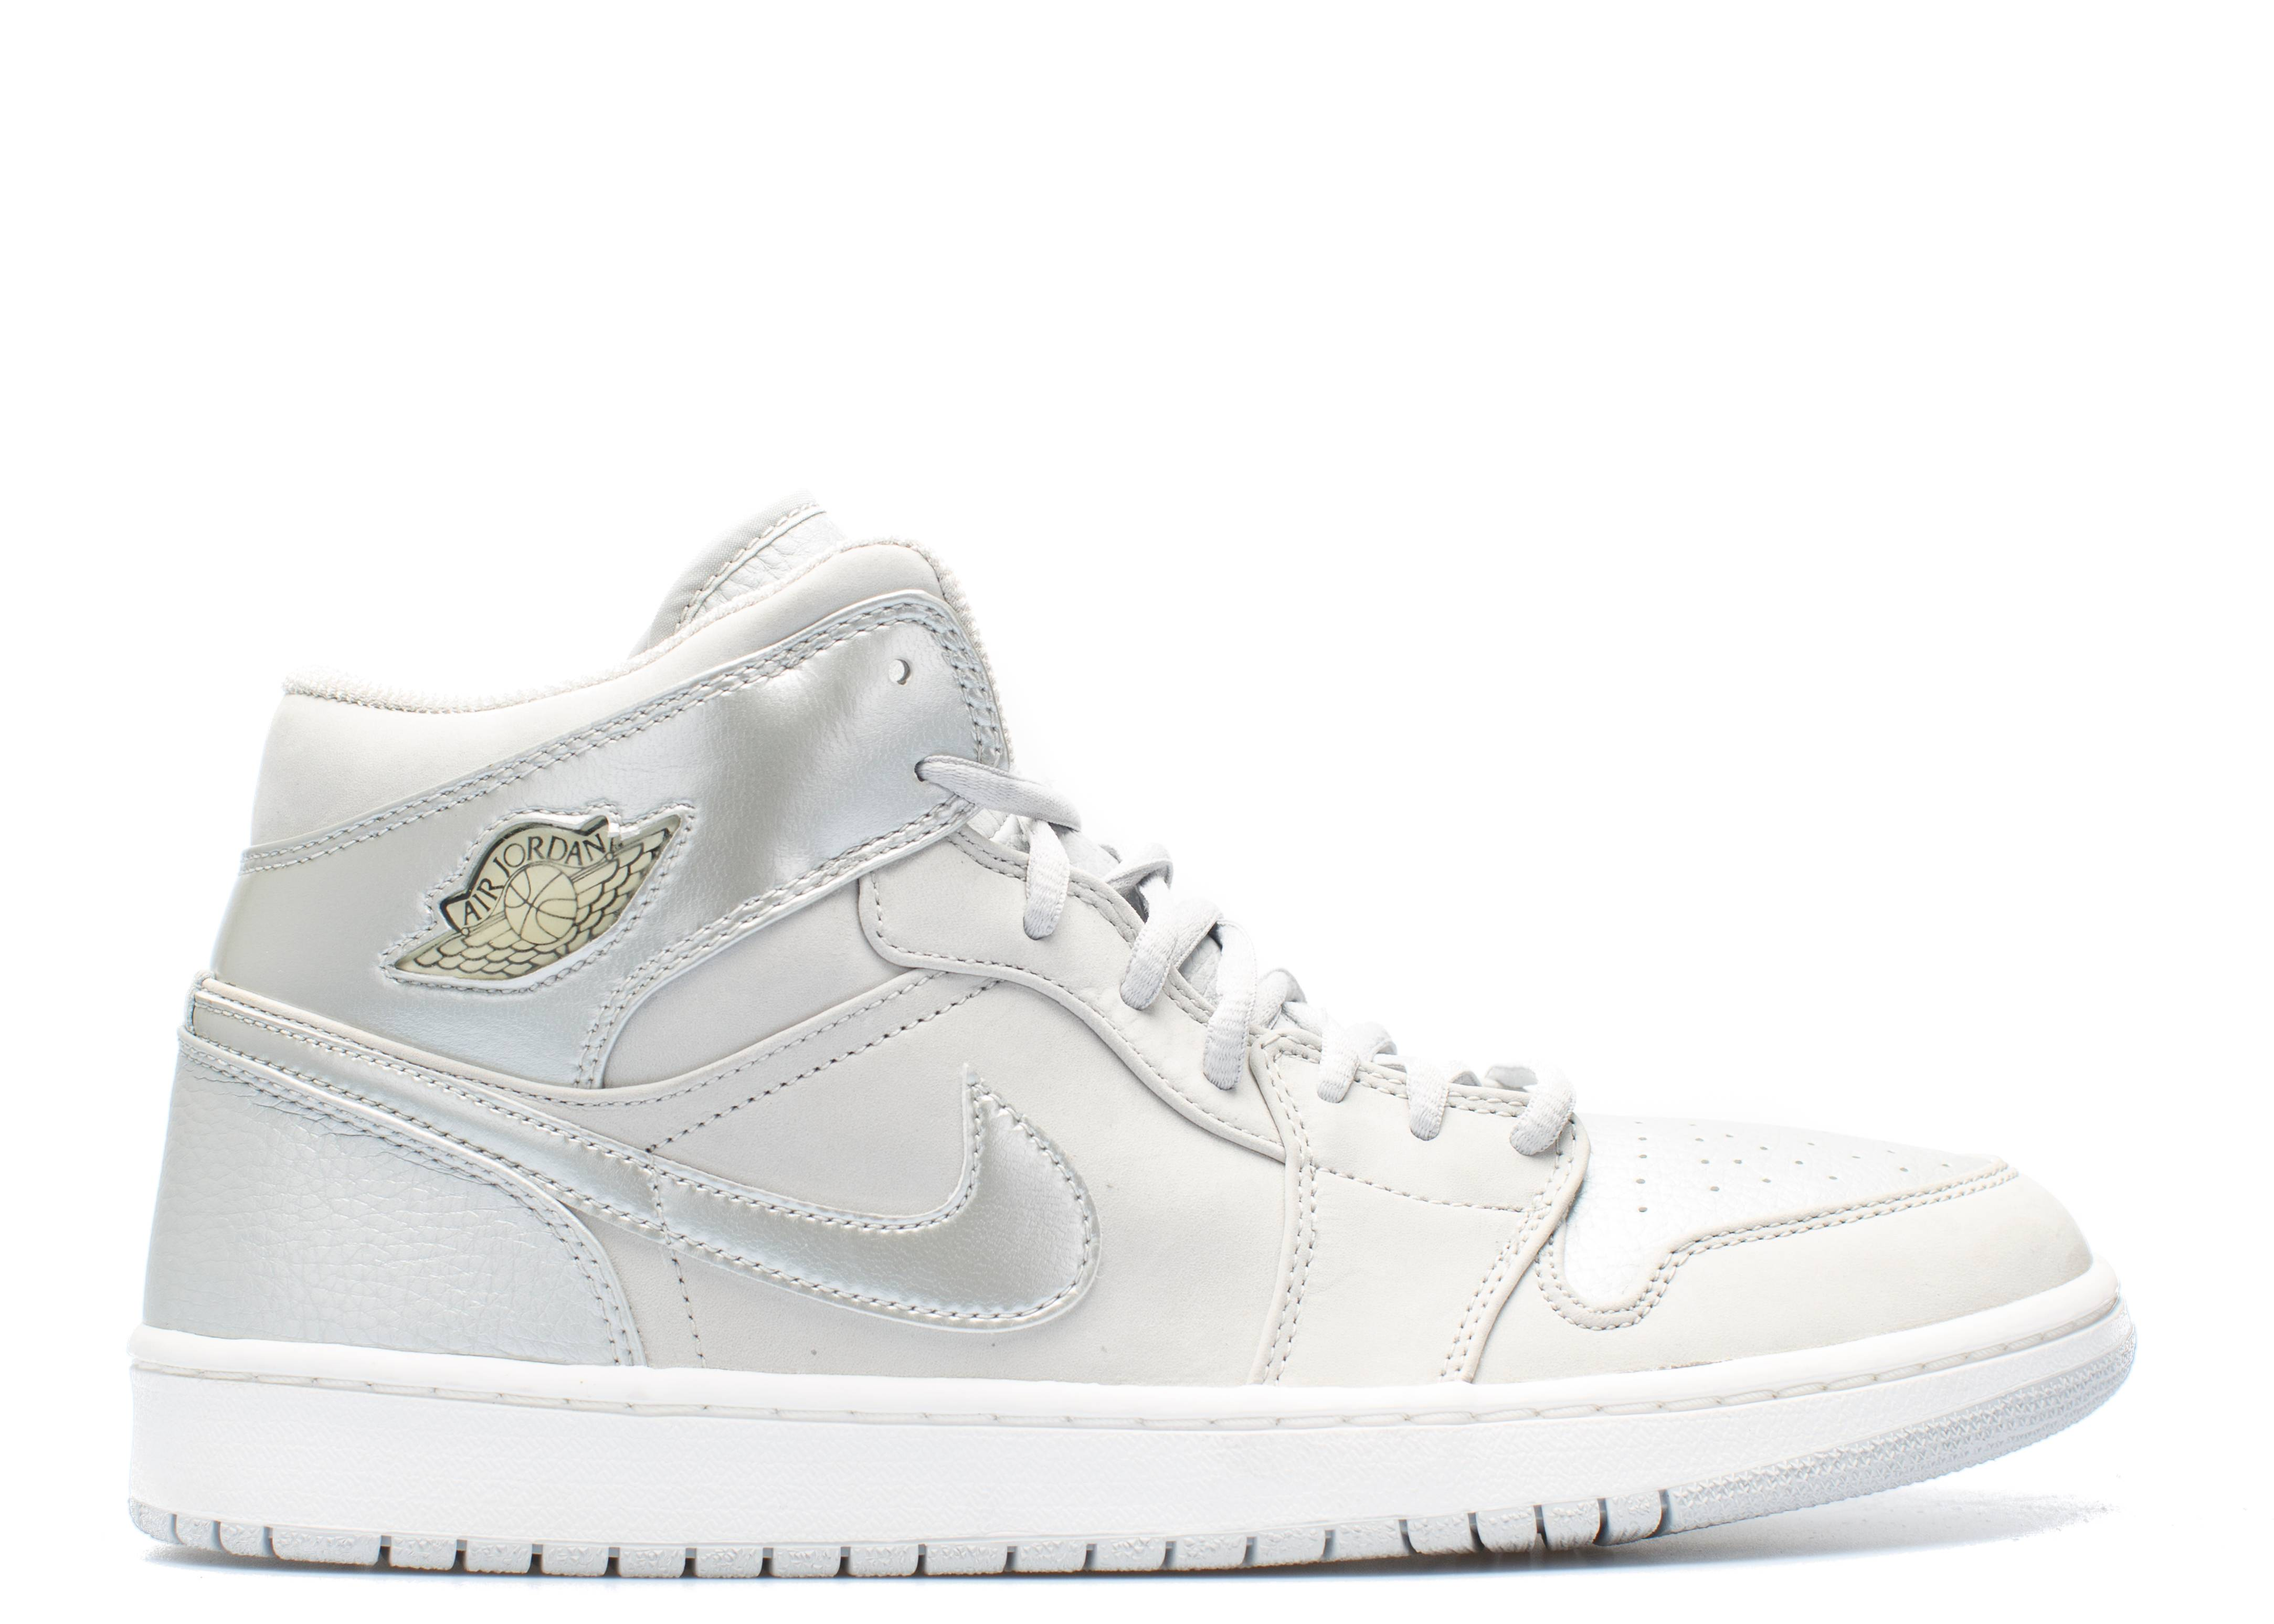 090f6c66c99a28 Air Jordan 1 Retro +